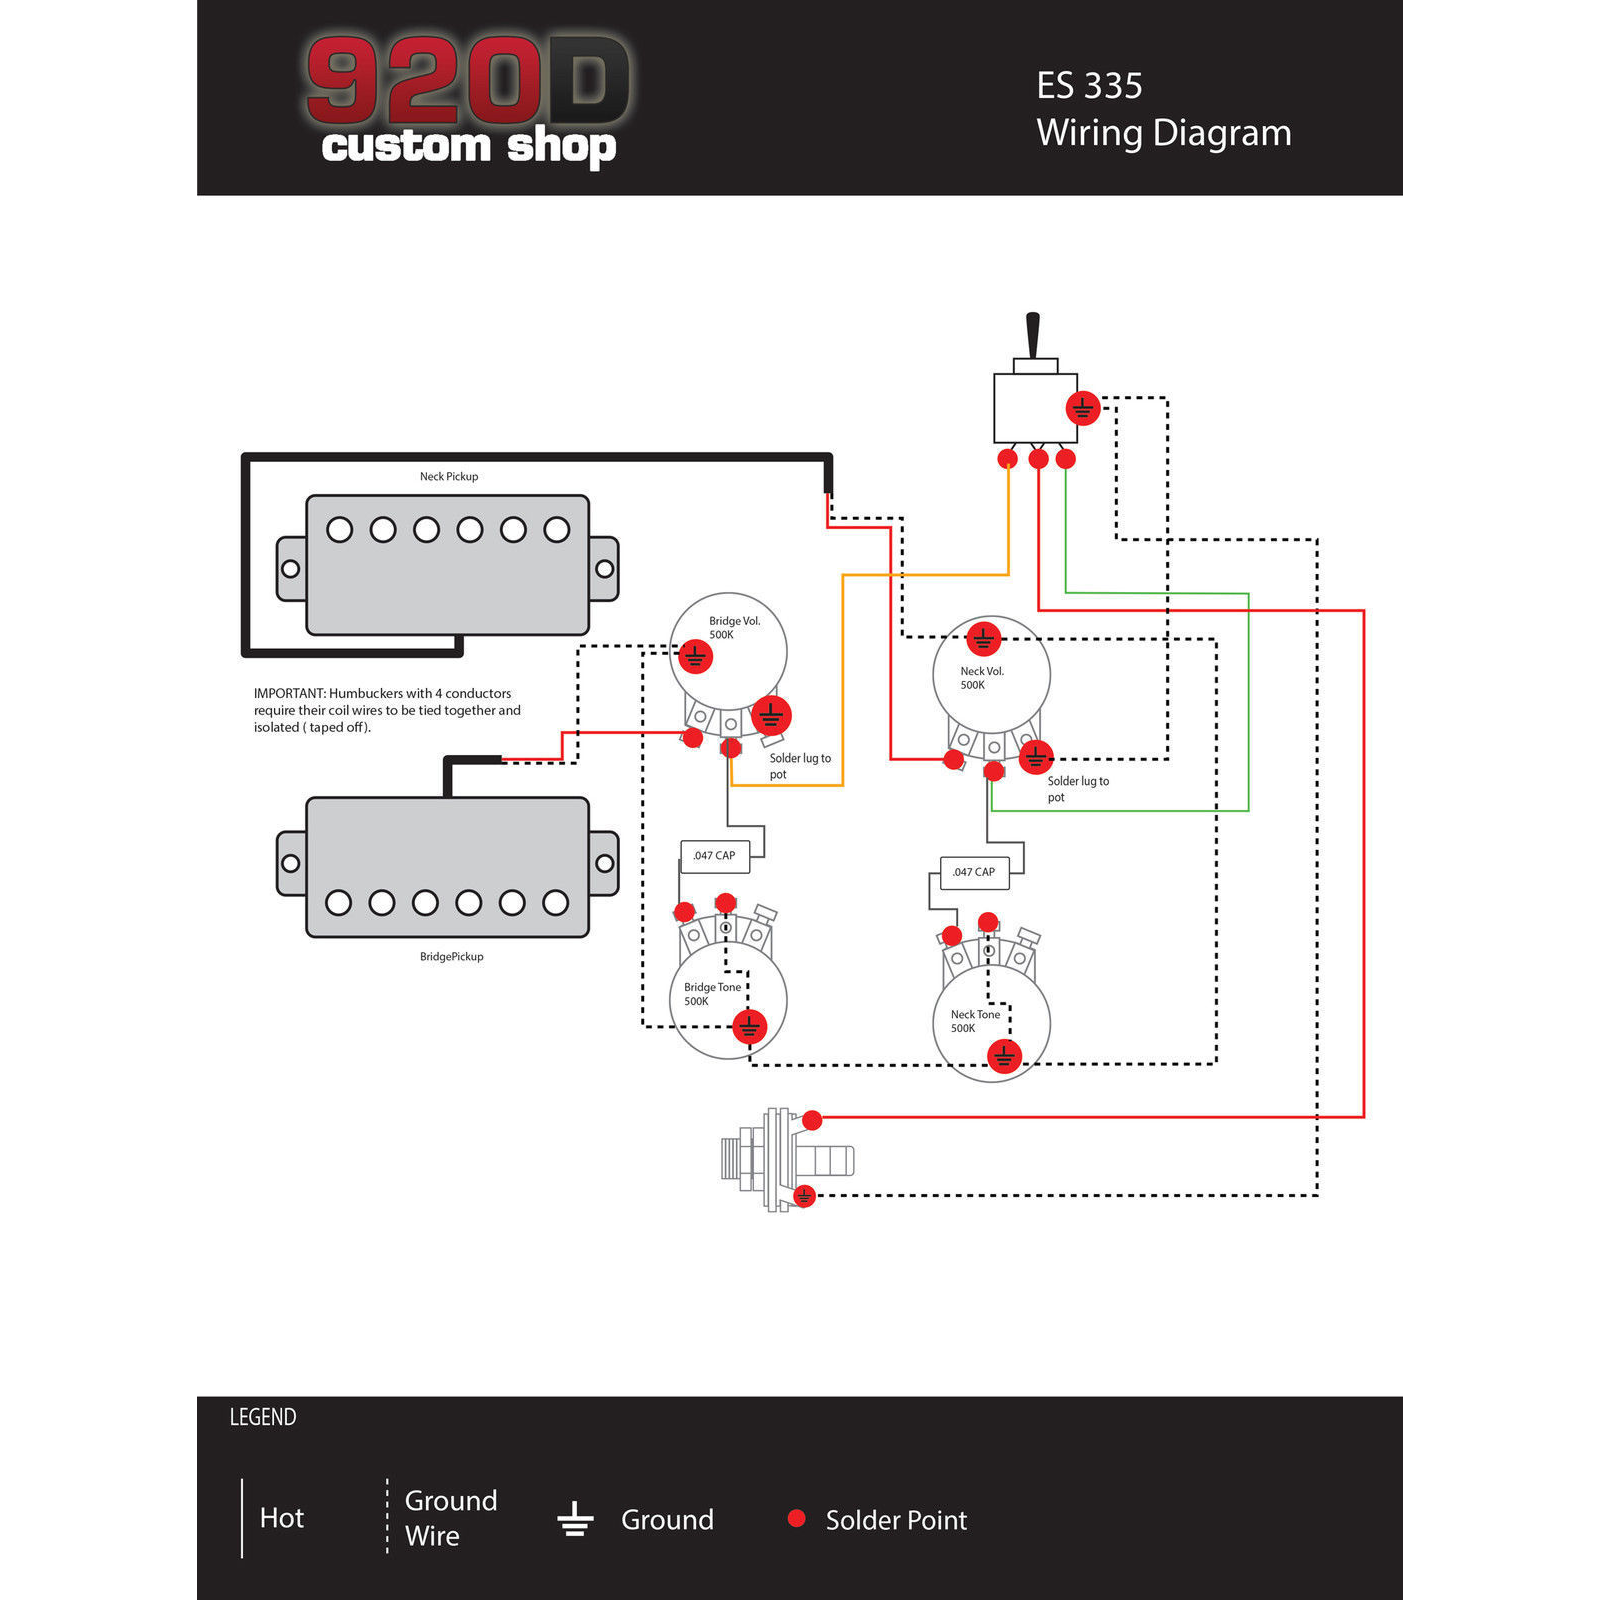 Es 335 Wiring Diagram Further Seymour Duncan Les Paul Wiring Diagram